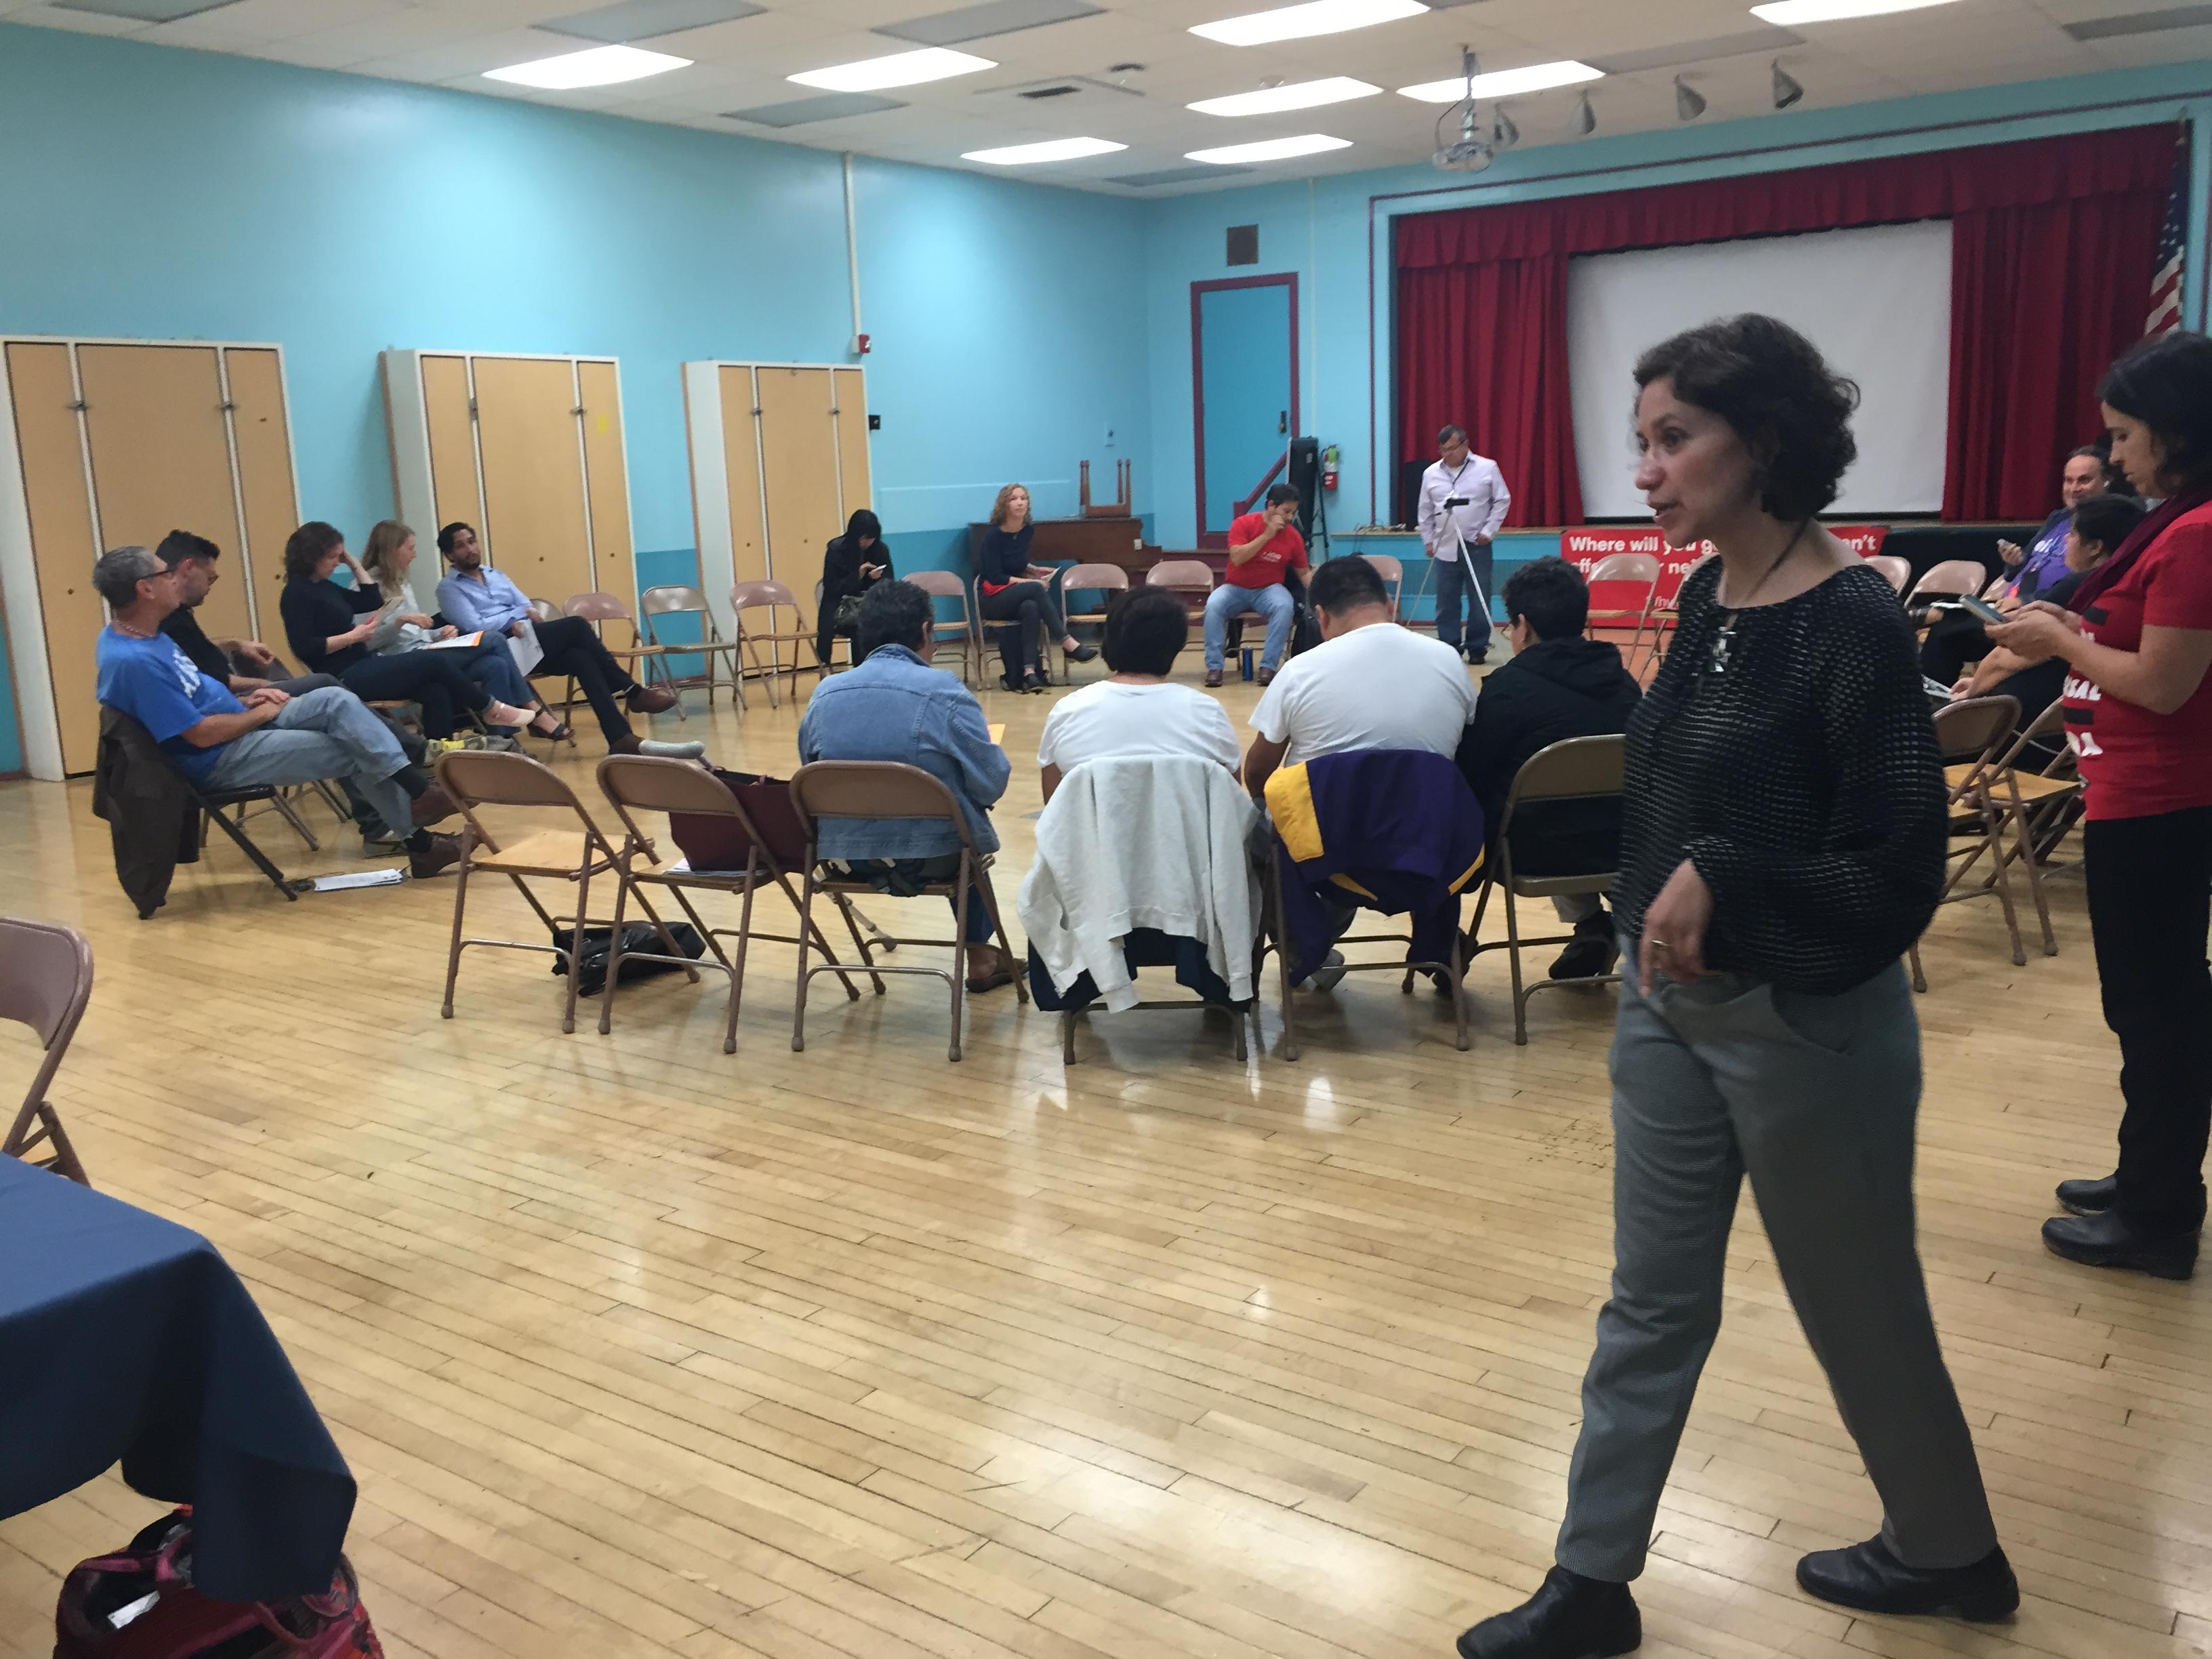 Echo Park Neighborhood Council